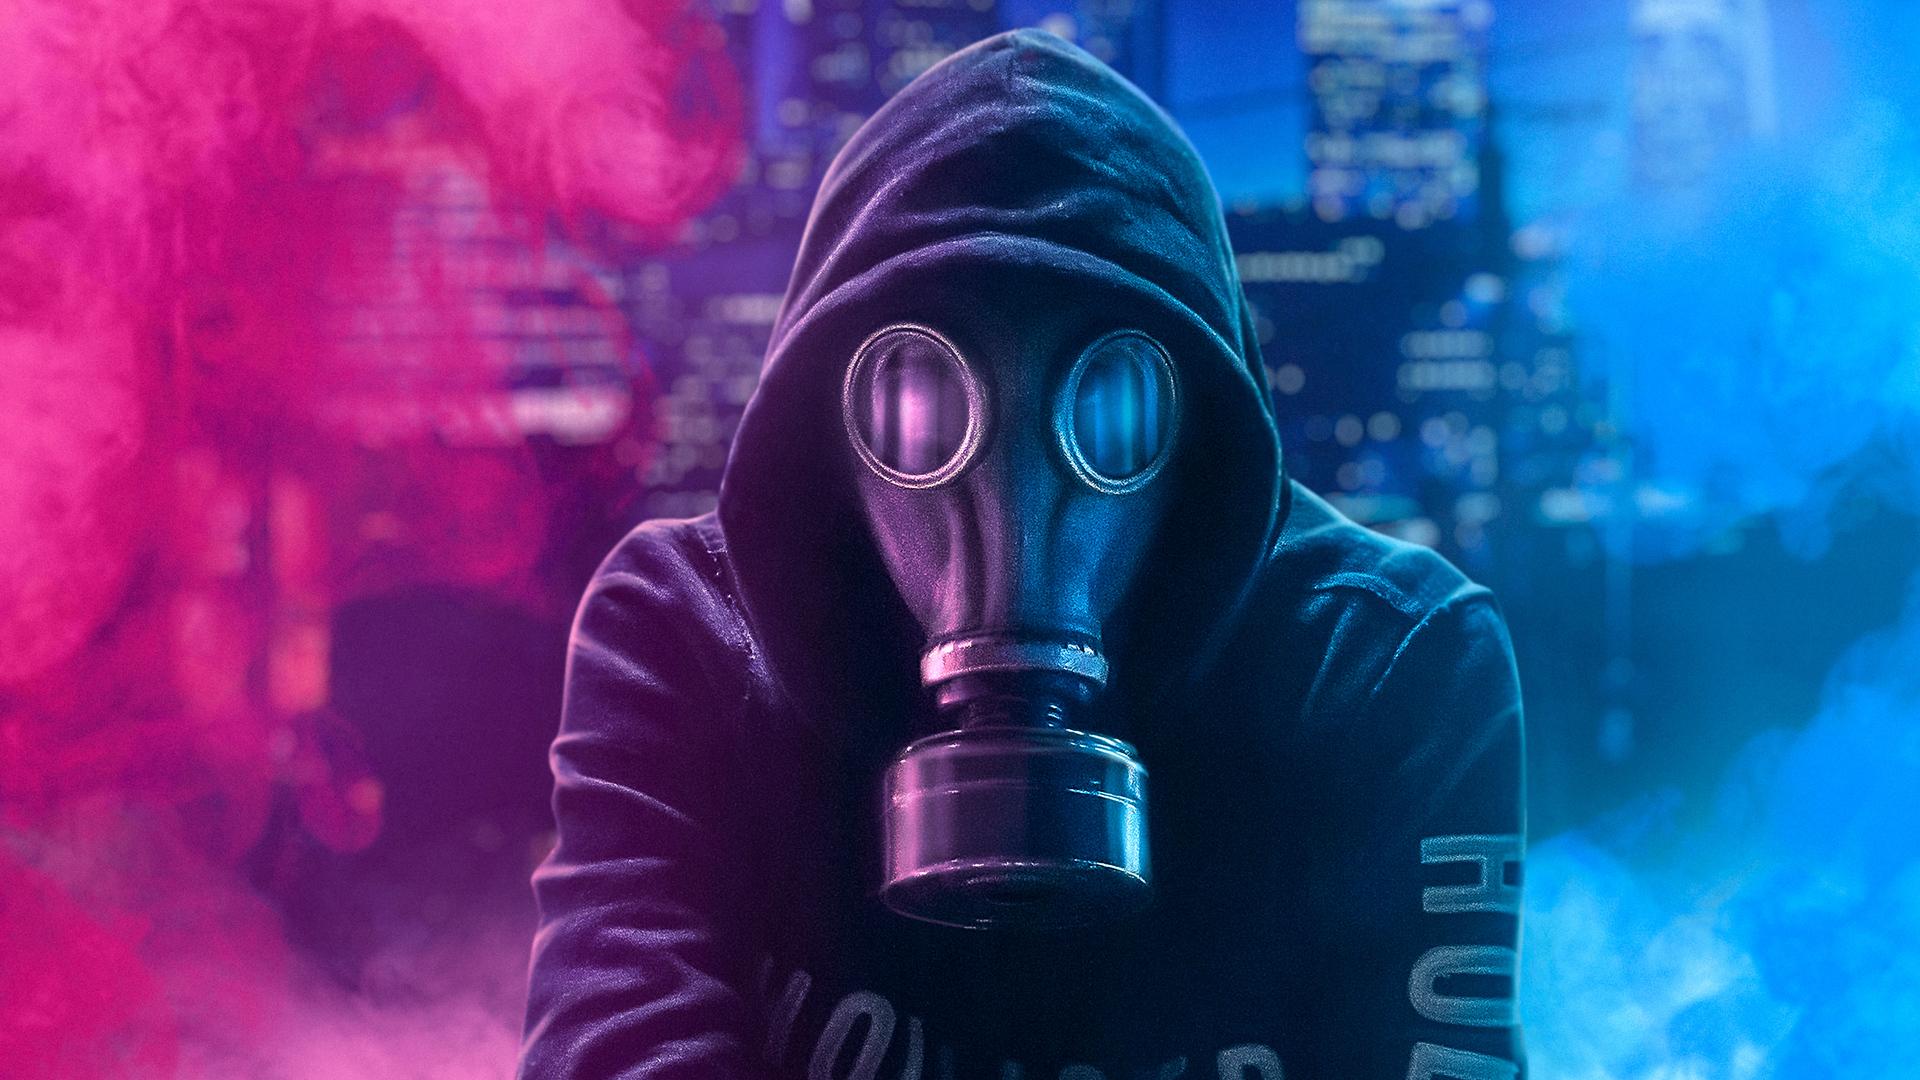 1920x1080 Hoodie Guy Mask Man 4k Laptop Full Hd 1080p Hd 4k